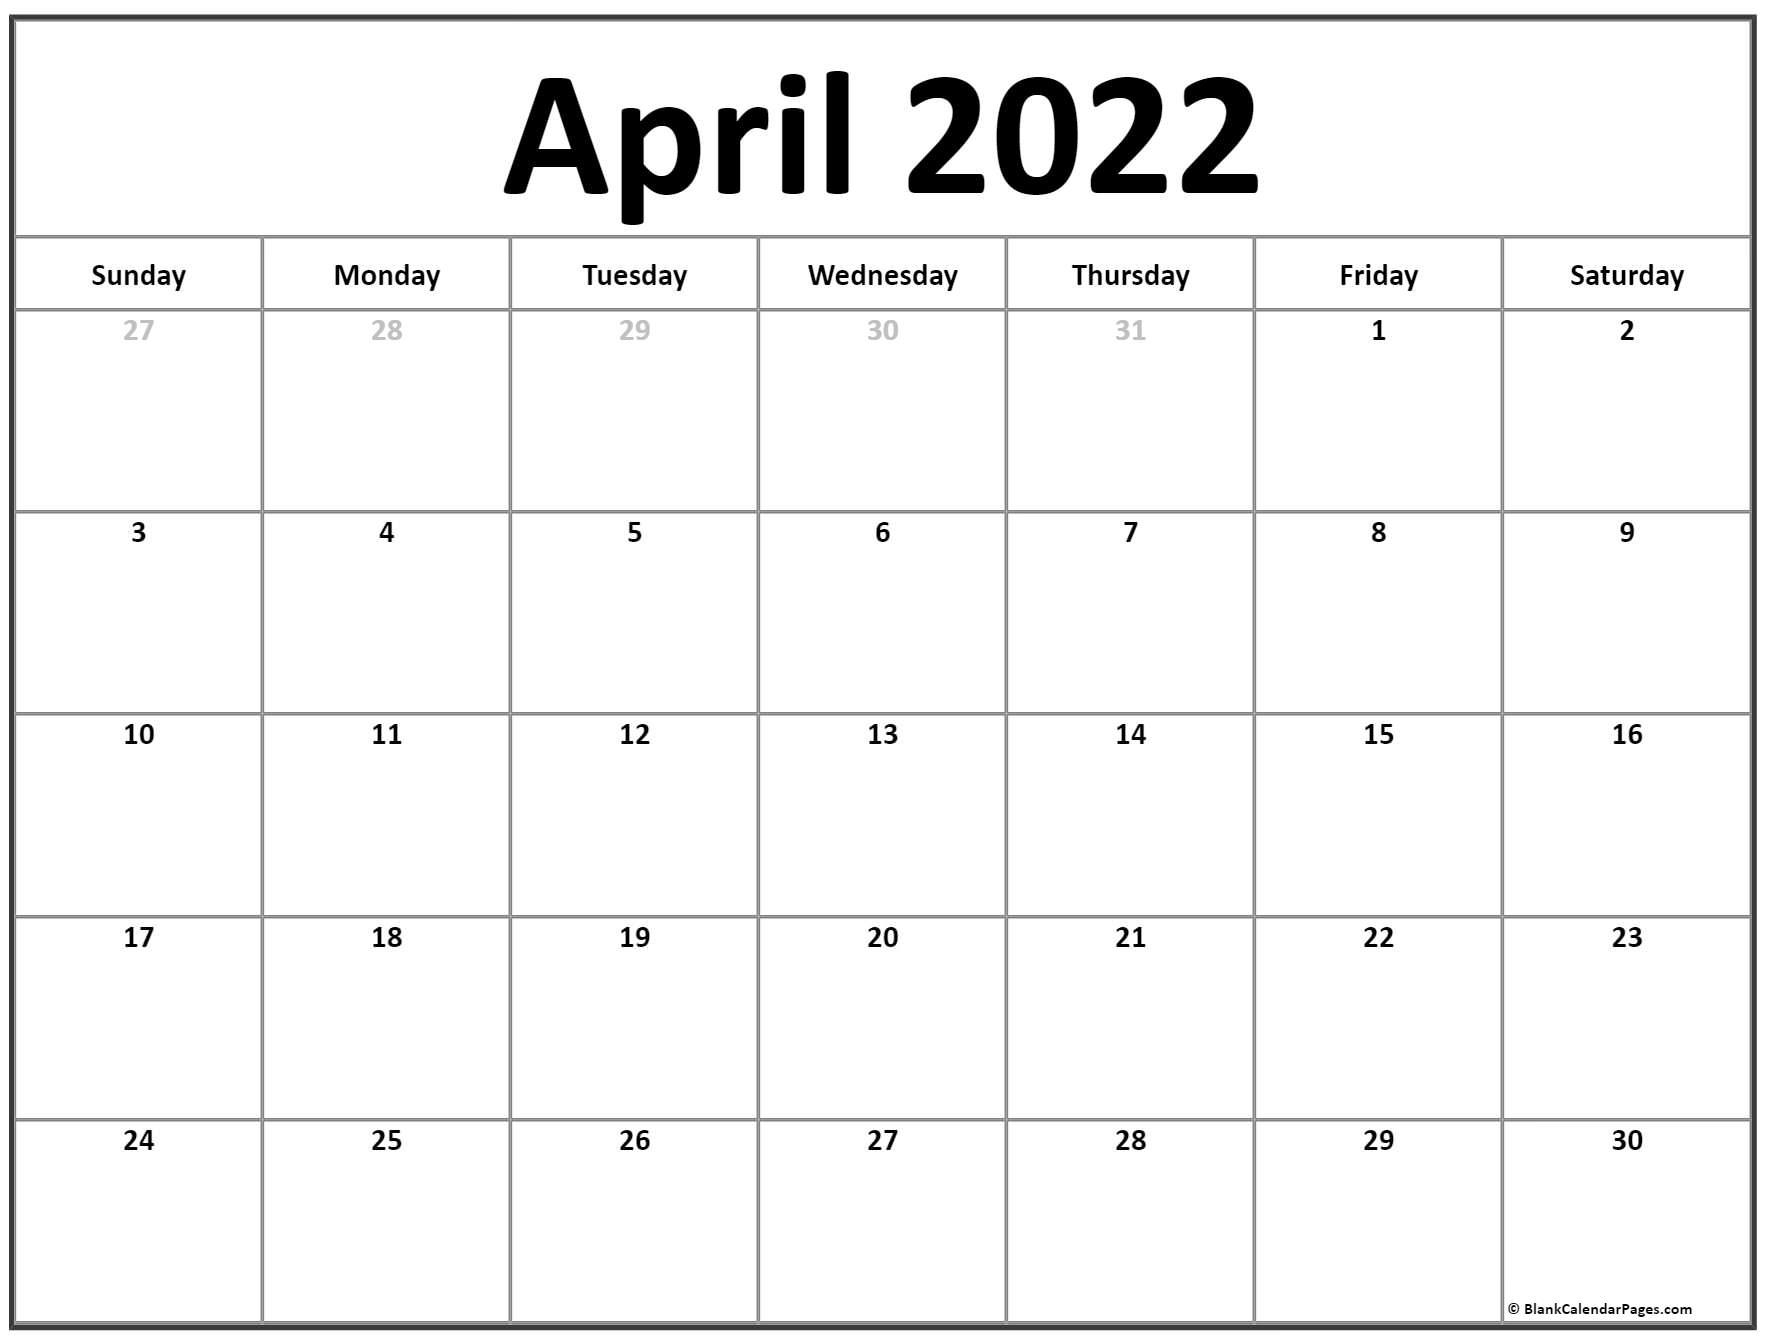 April 2022 Calendar | Free Printable Calendar Templates